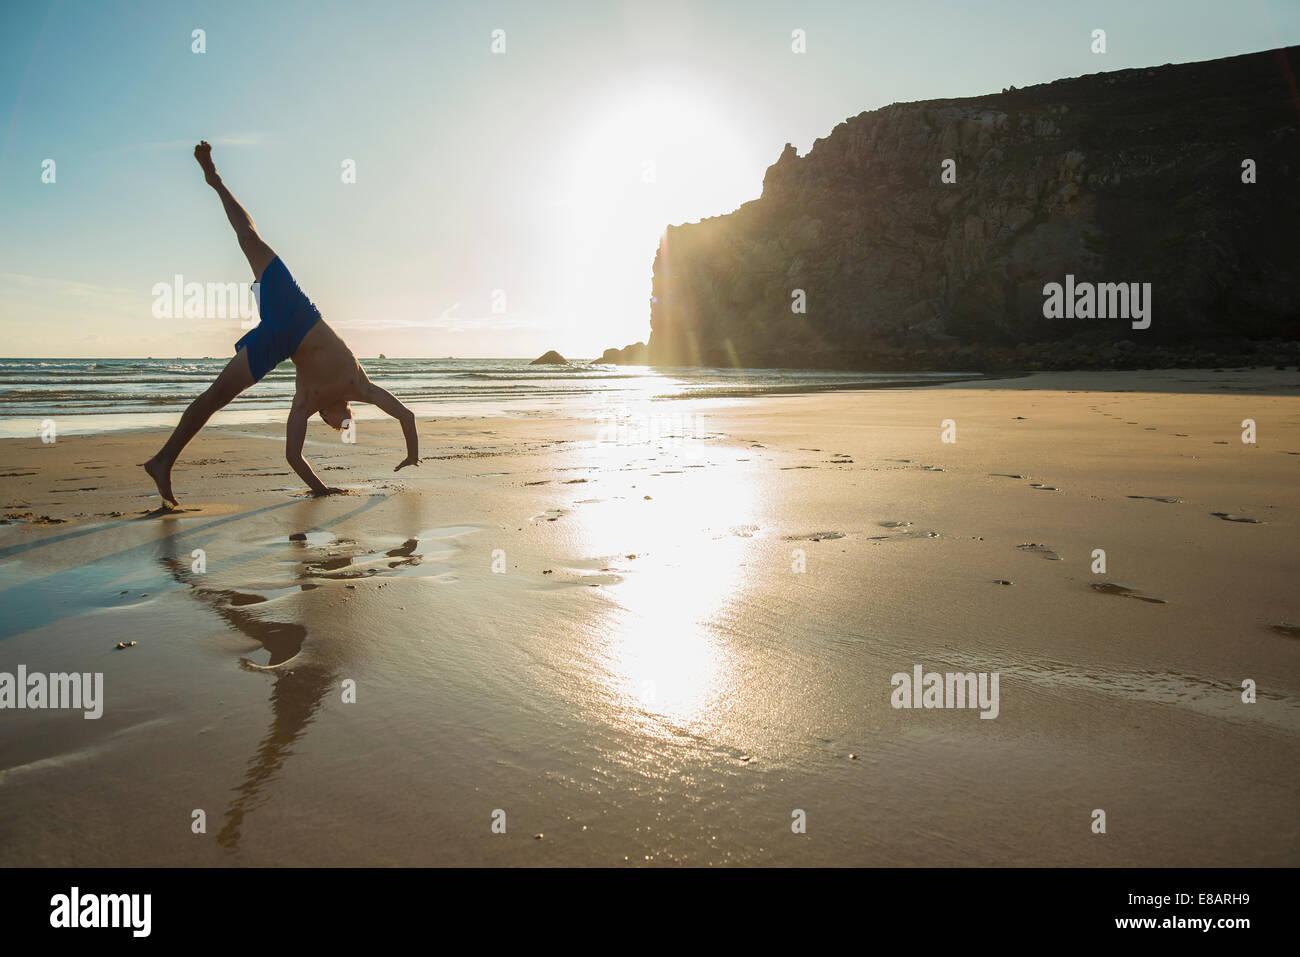 Teenage boy doing handstand on beach, Camaret-sur-mer, Brittany, France - Stock Image